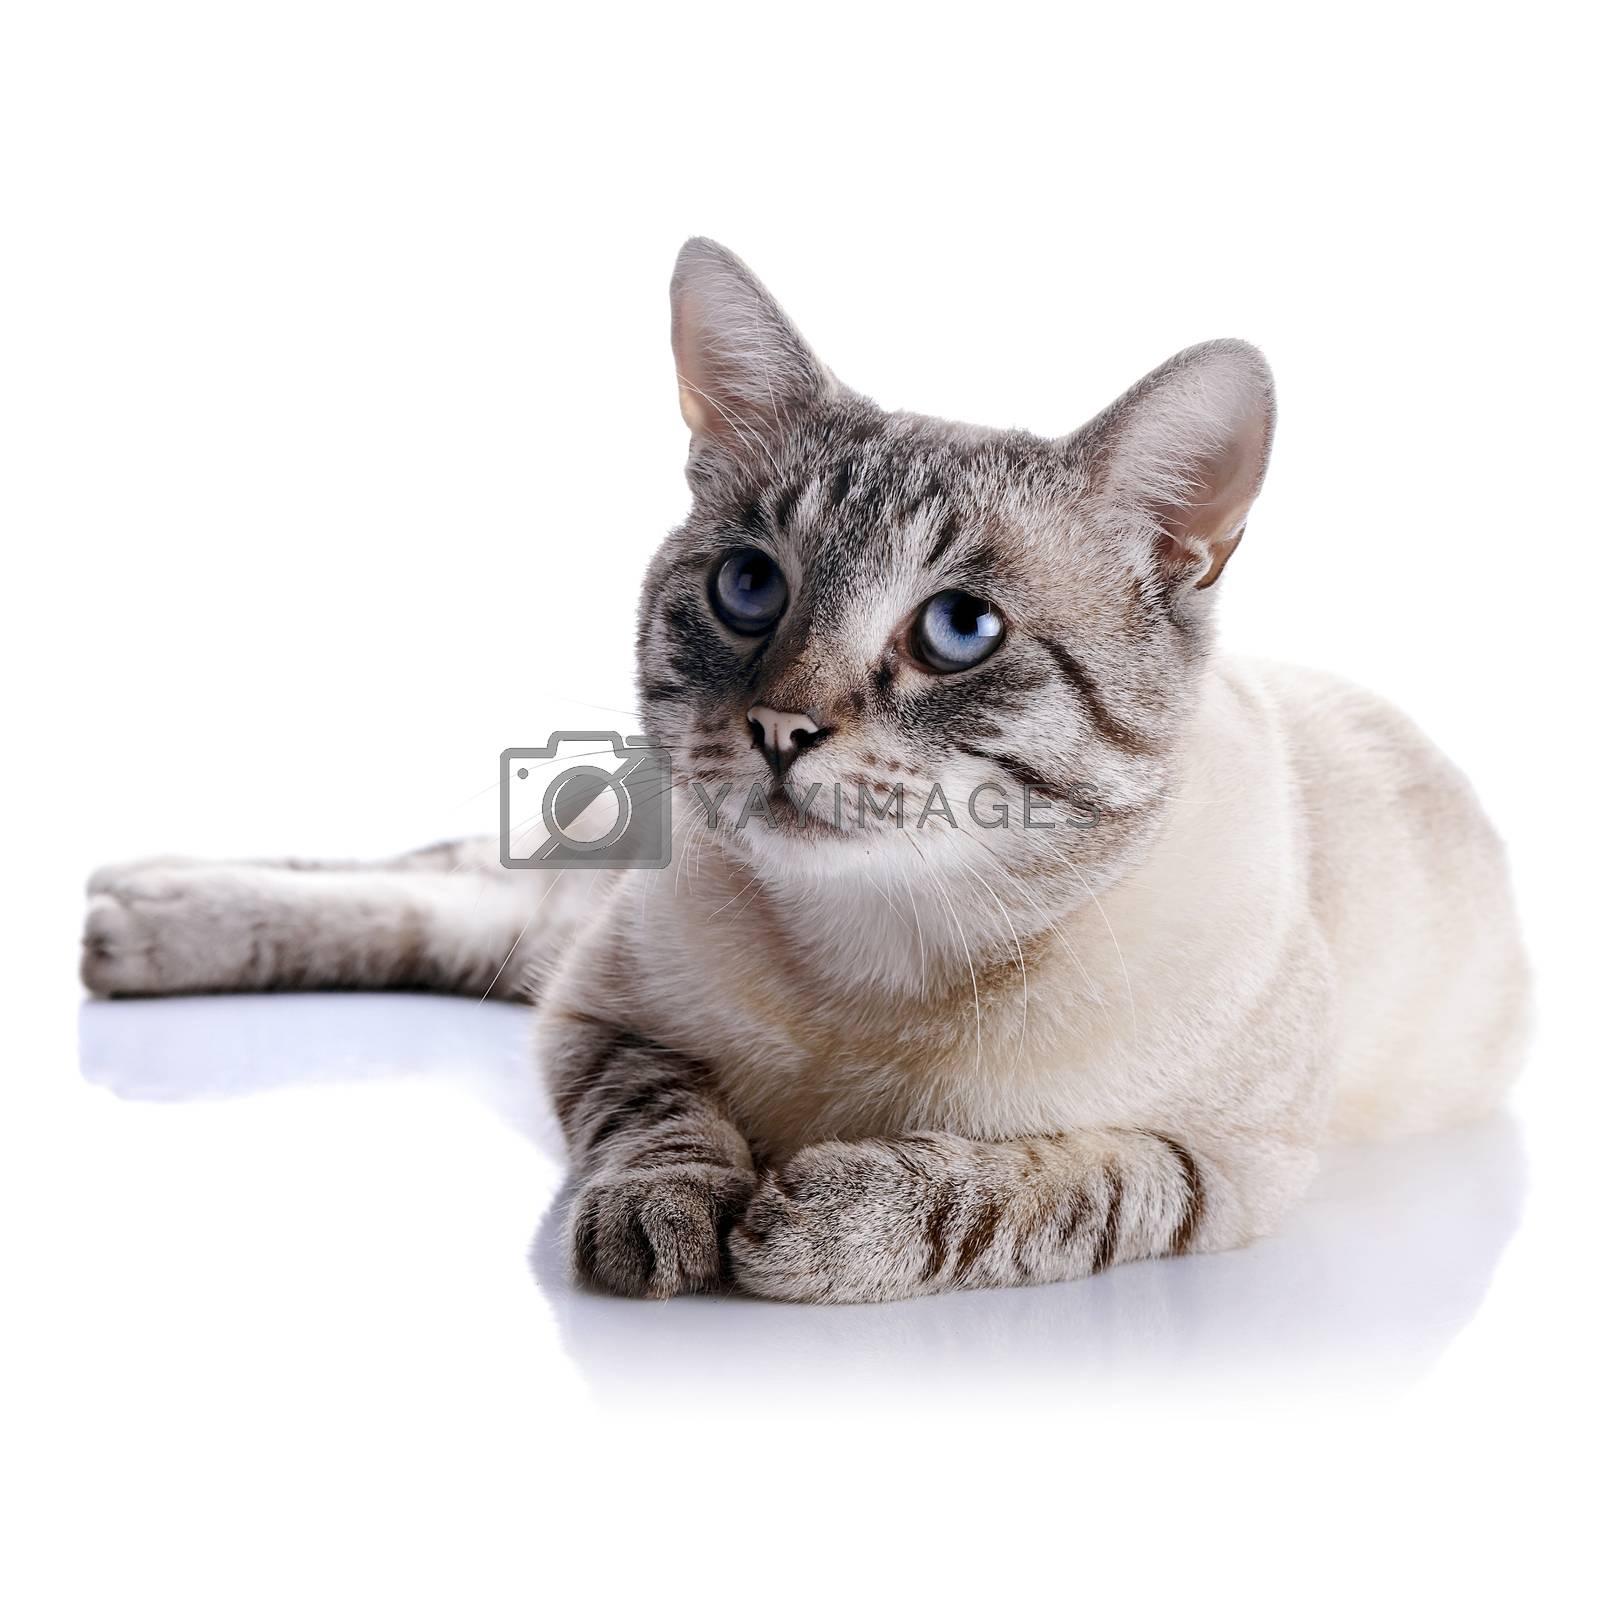 Royalty free image of Striped blue-eyed cat by Azaliya